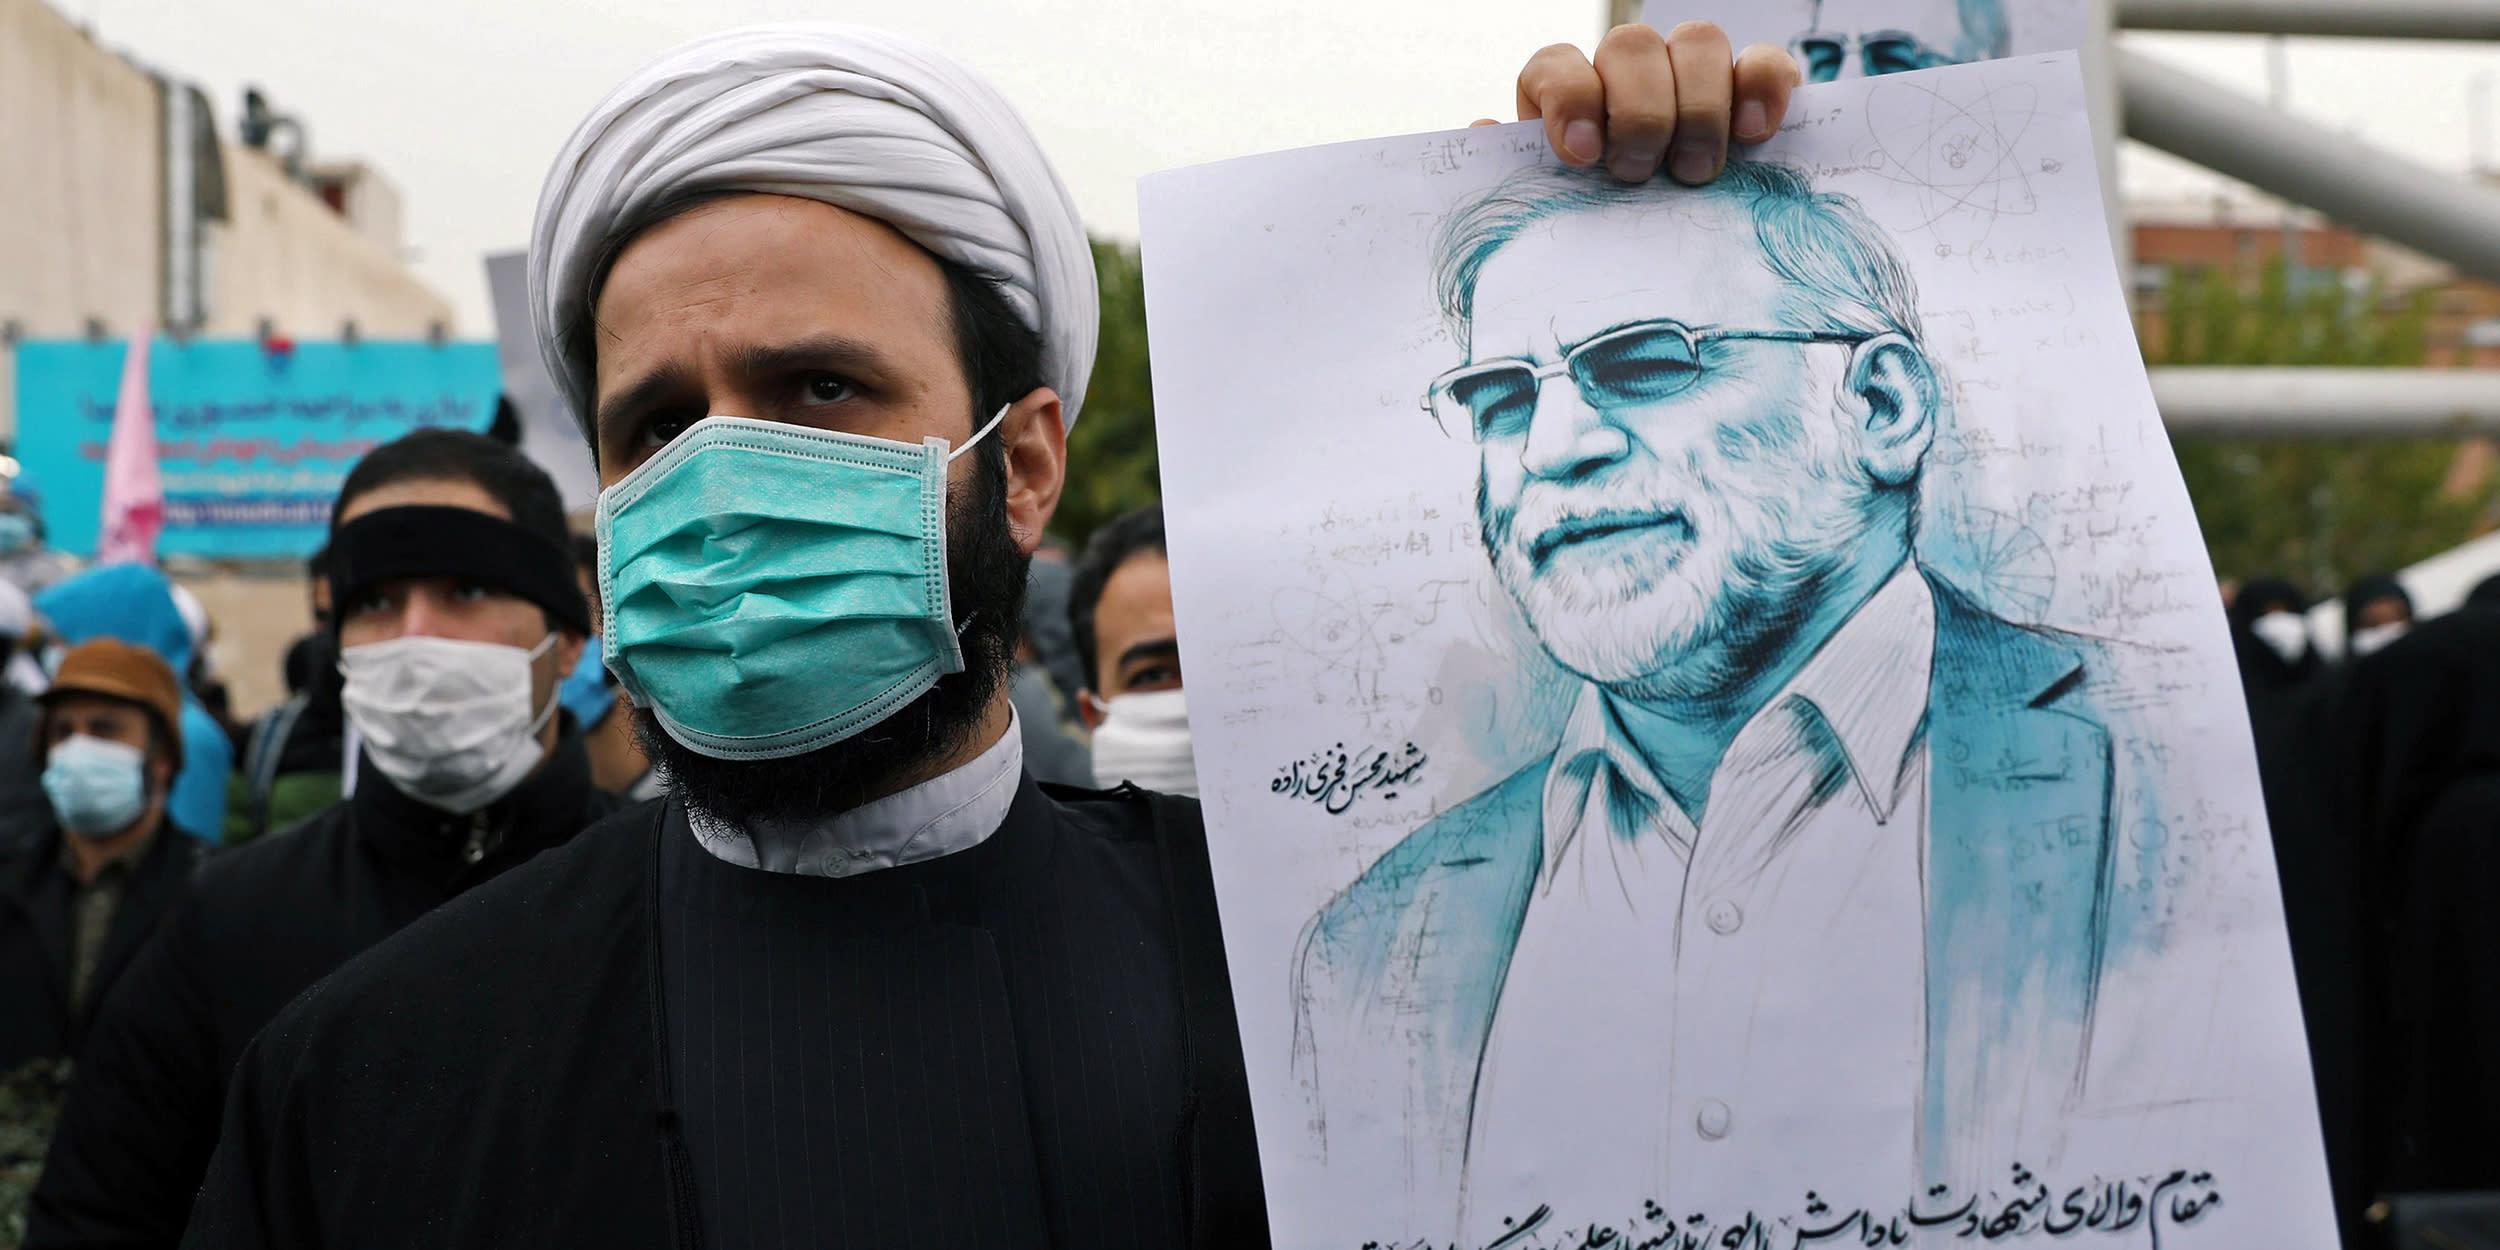 Iran's supreme leader vows retaliation for assassination of leading scientist